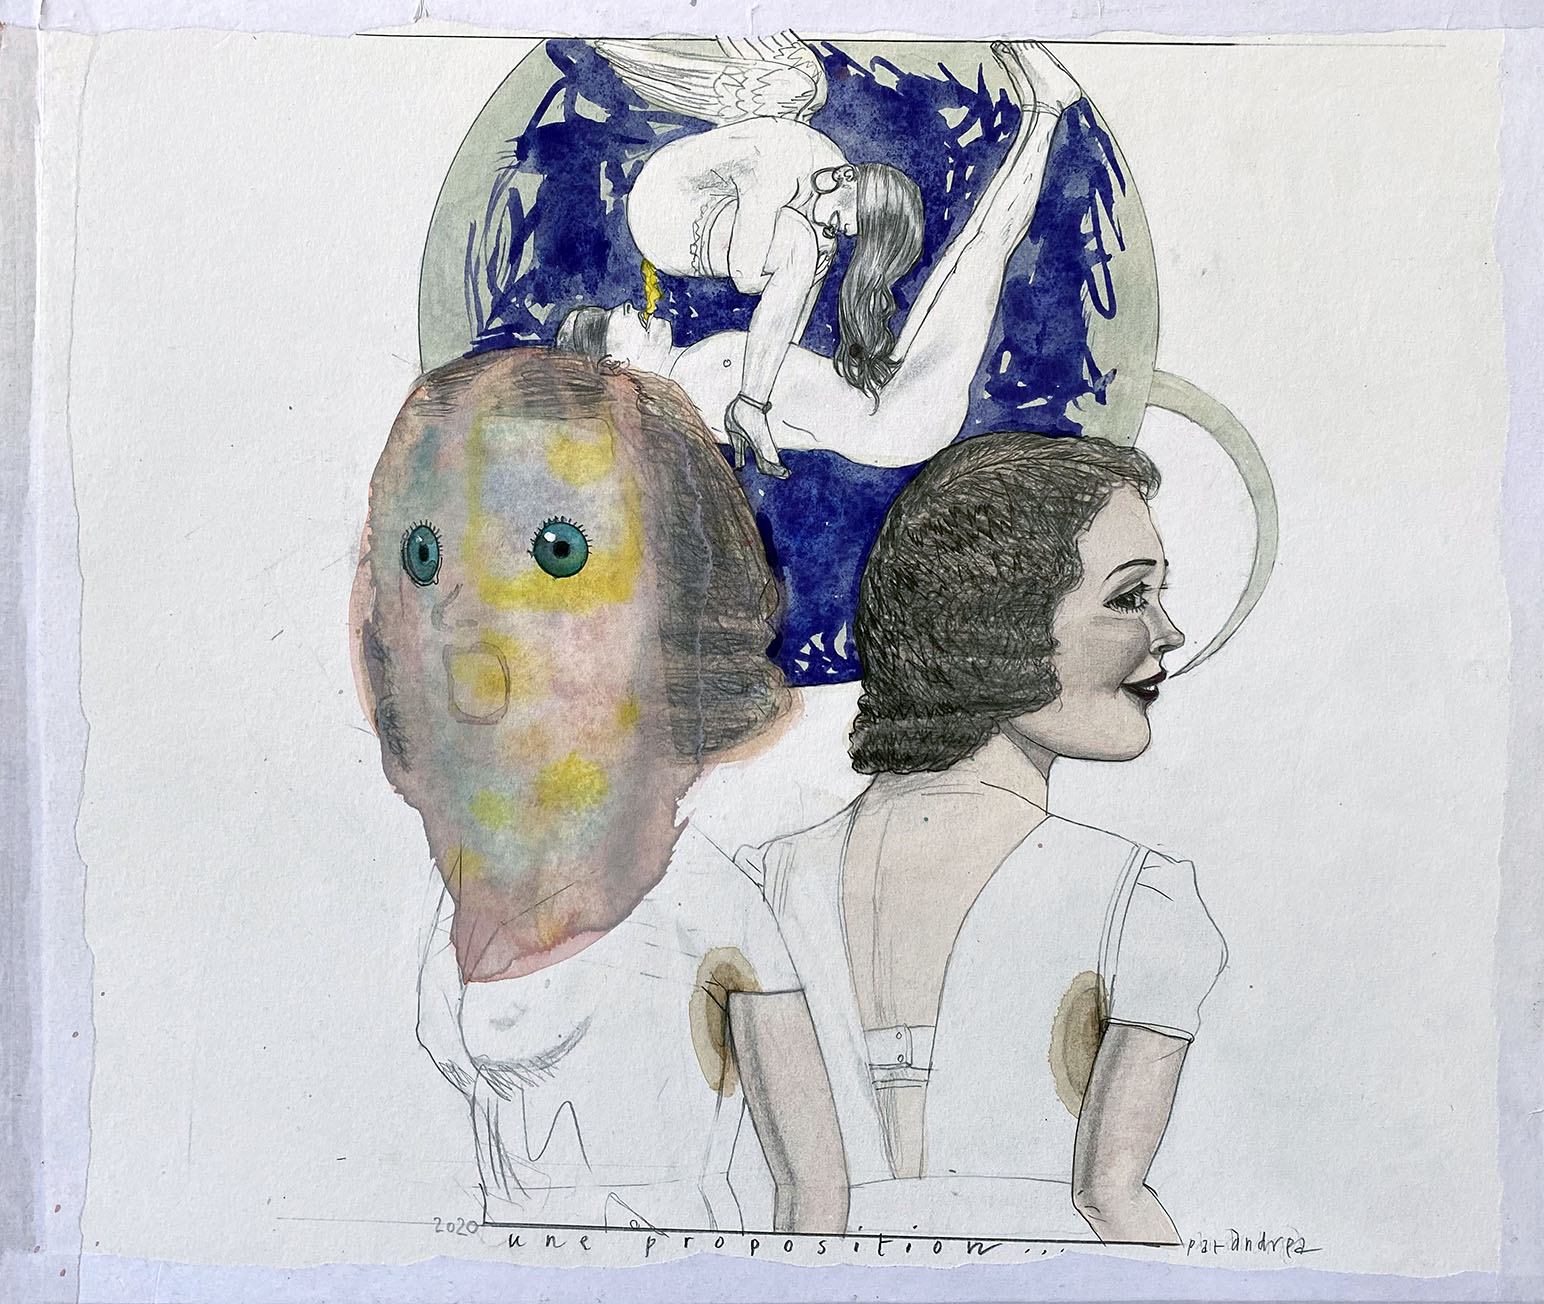 Pat Andrea, Une proposition, mixed media on paper, 40 x 45 cm, 2020